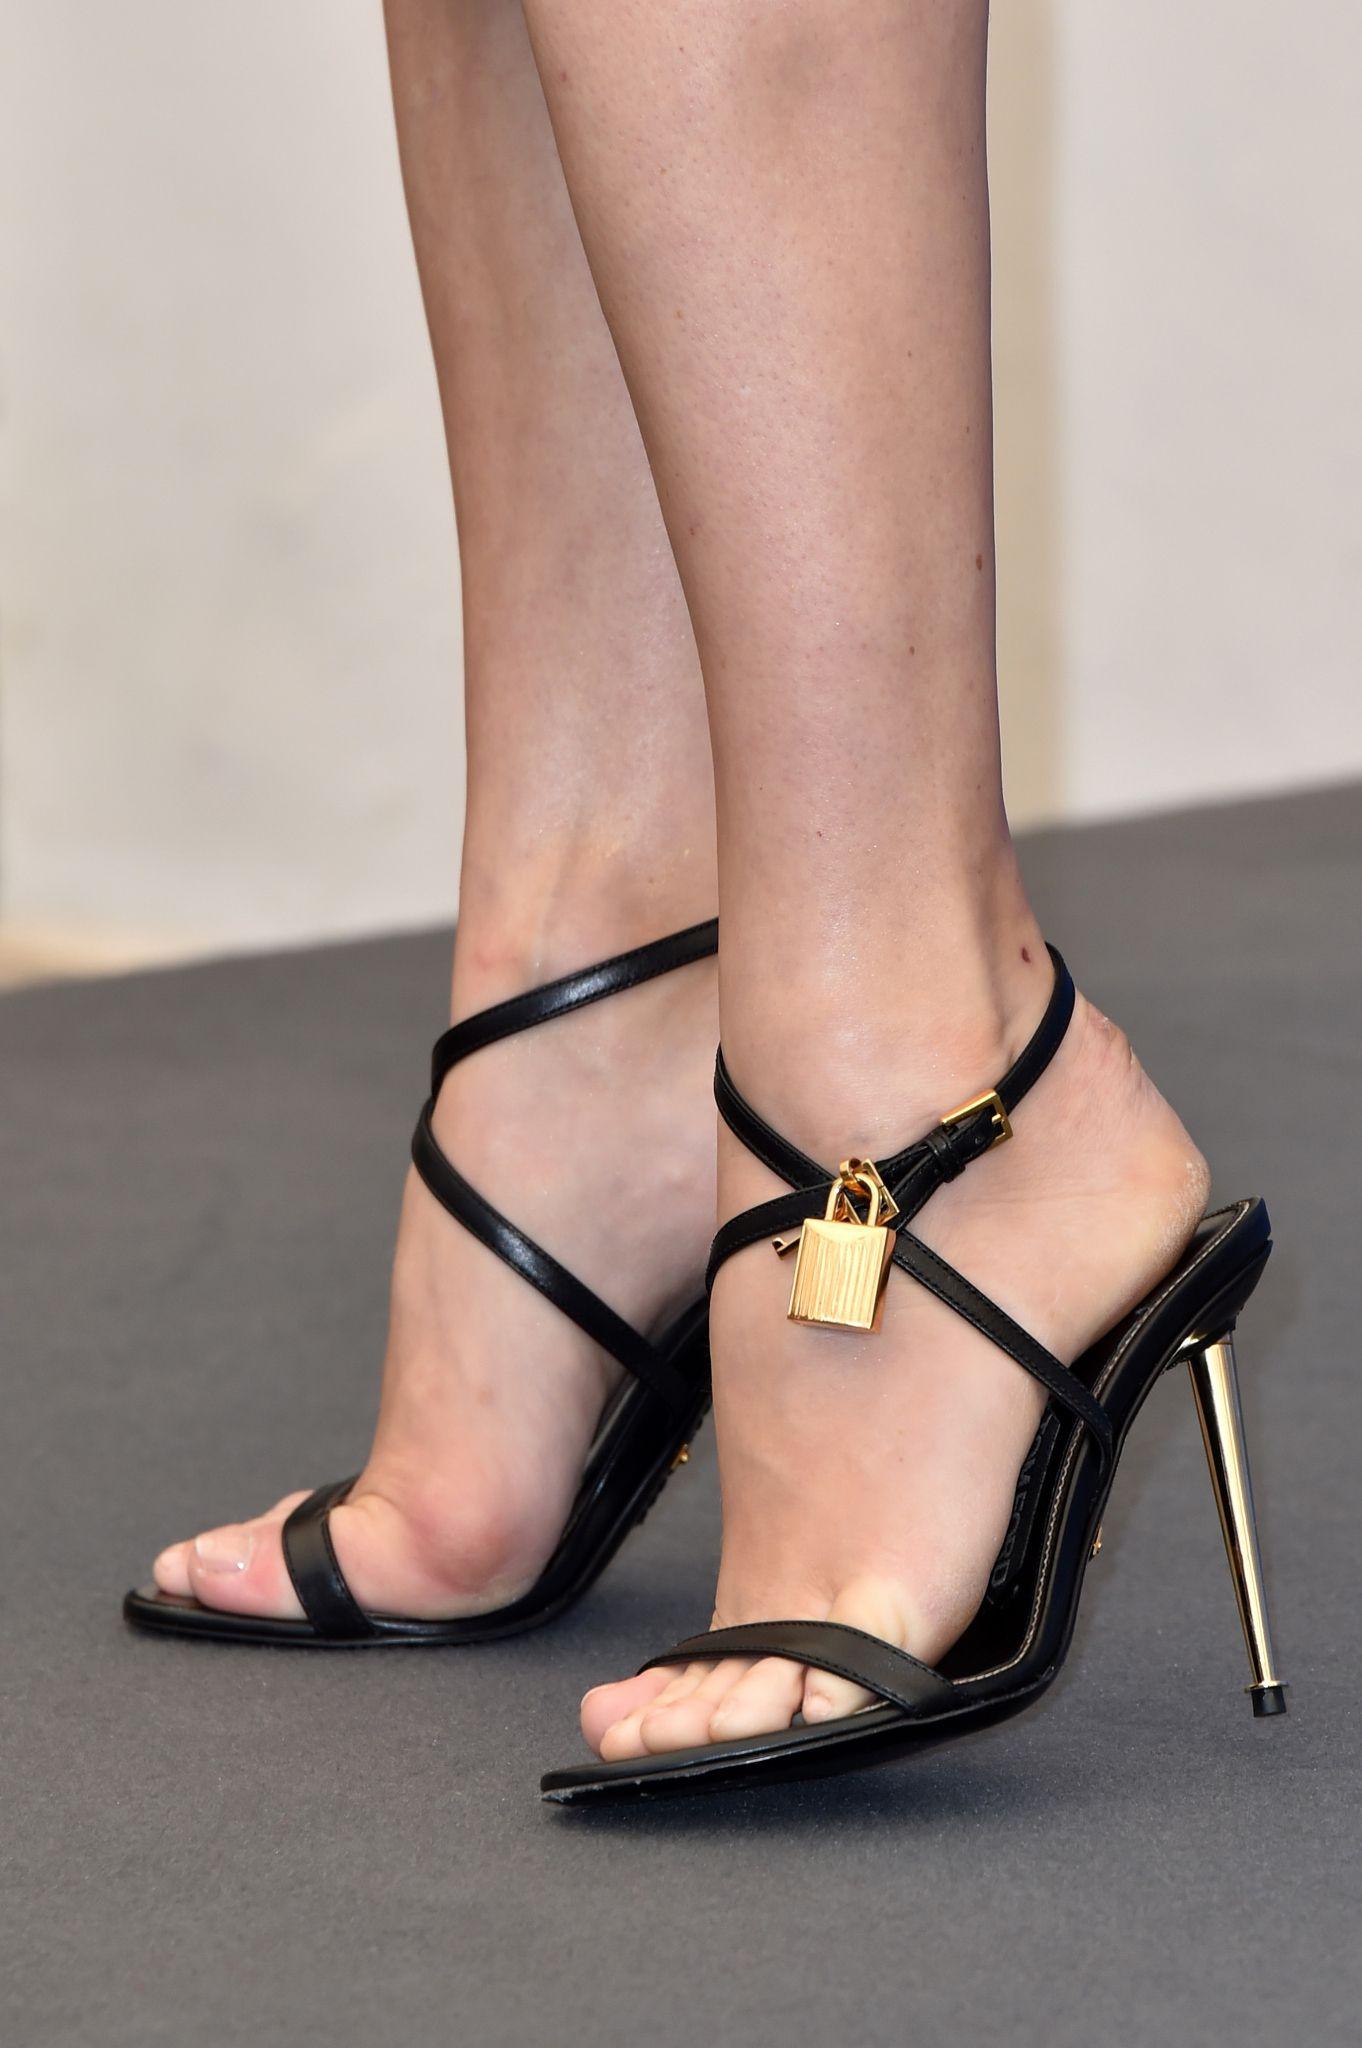 Amy Adams Wikifeet amy adams's feet << wikifeet